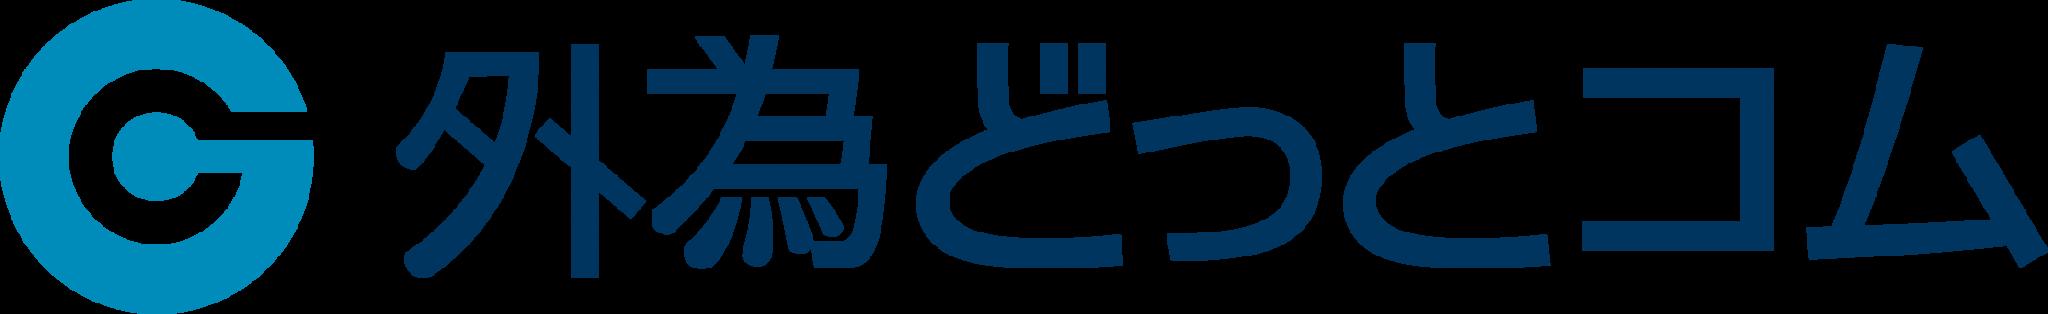 Gaitame logo